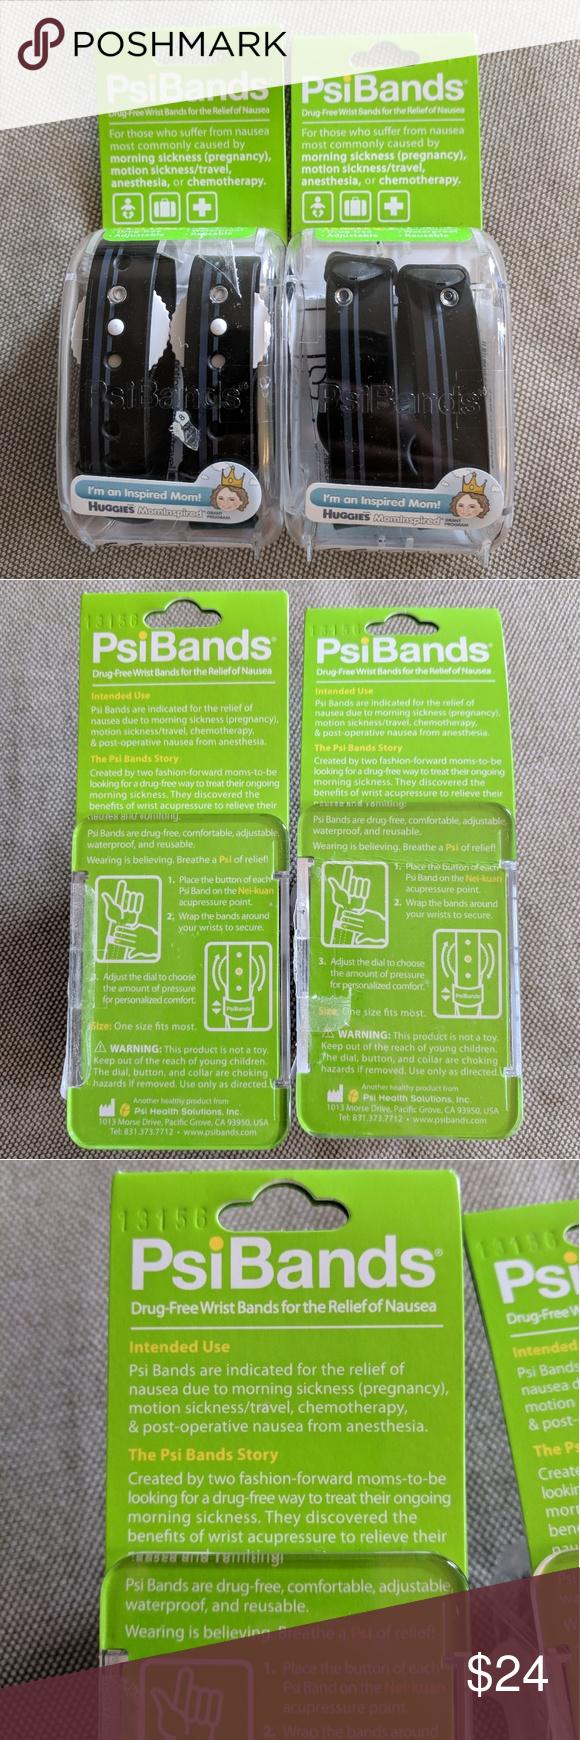 PsiBands Acupressure Wrist Bands Maternity Nausea PsiBands ...